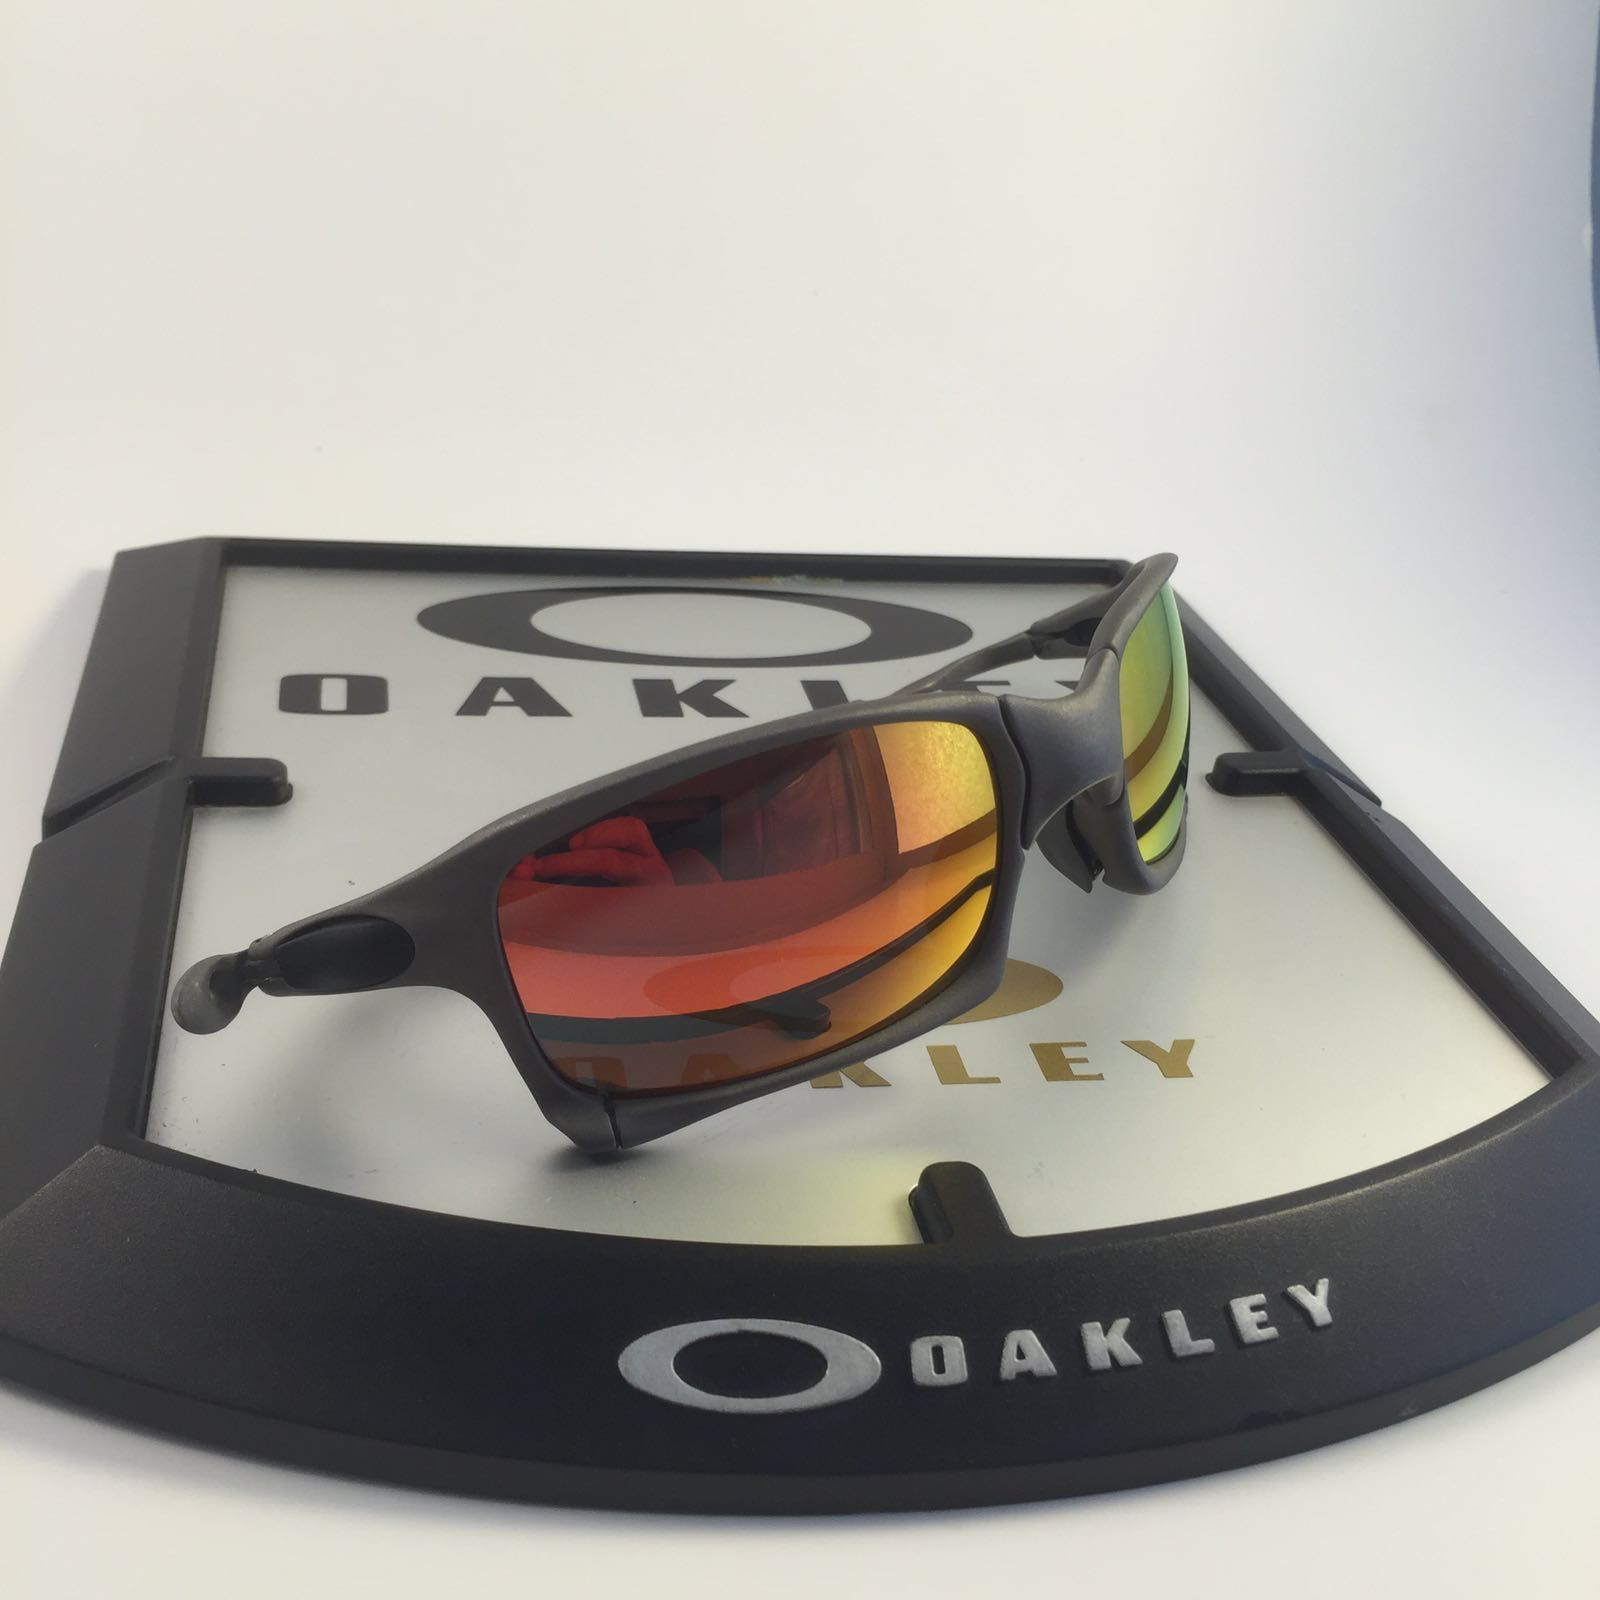 oakley x squared x-metal - 78ba5200-a949-4048-a855-7ec2050e905b.jpeg